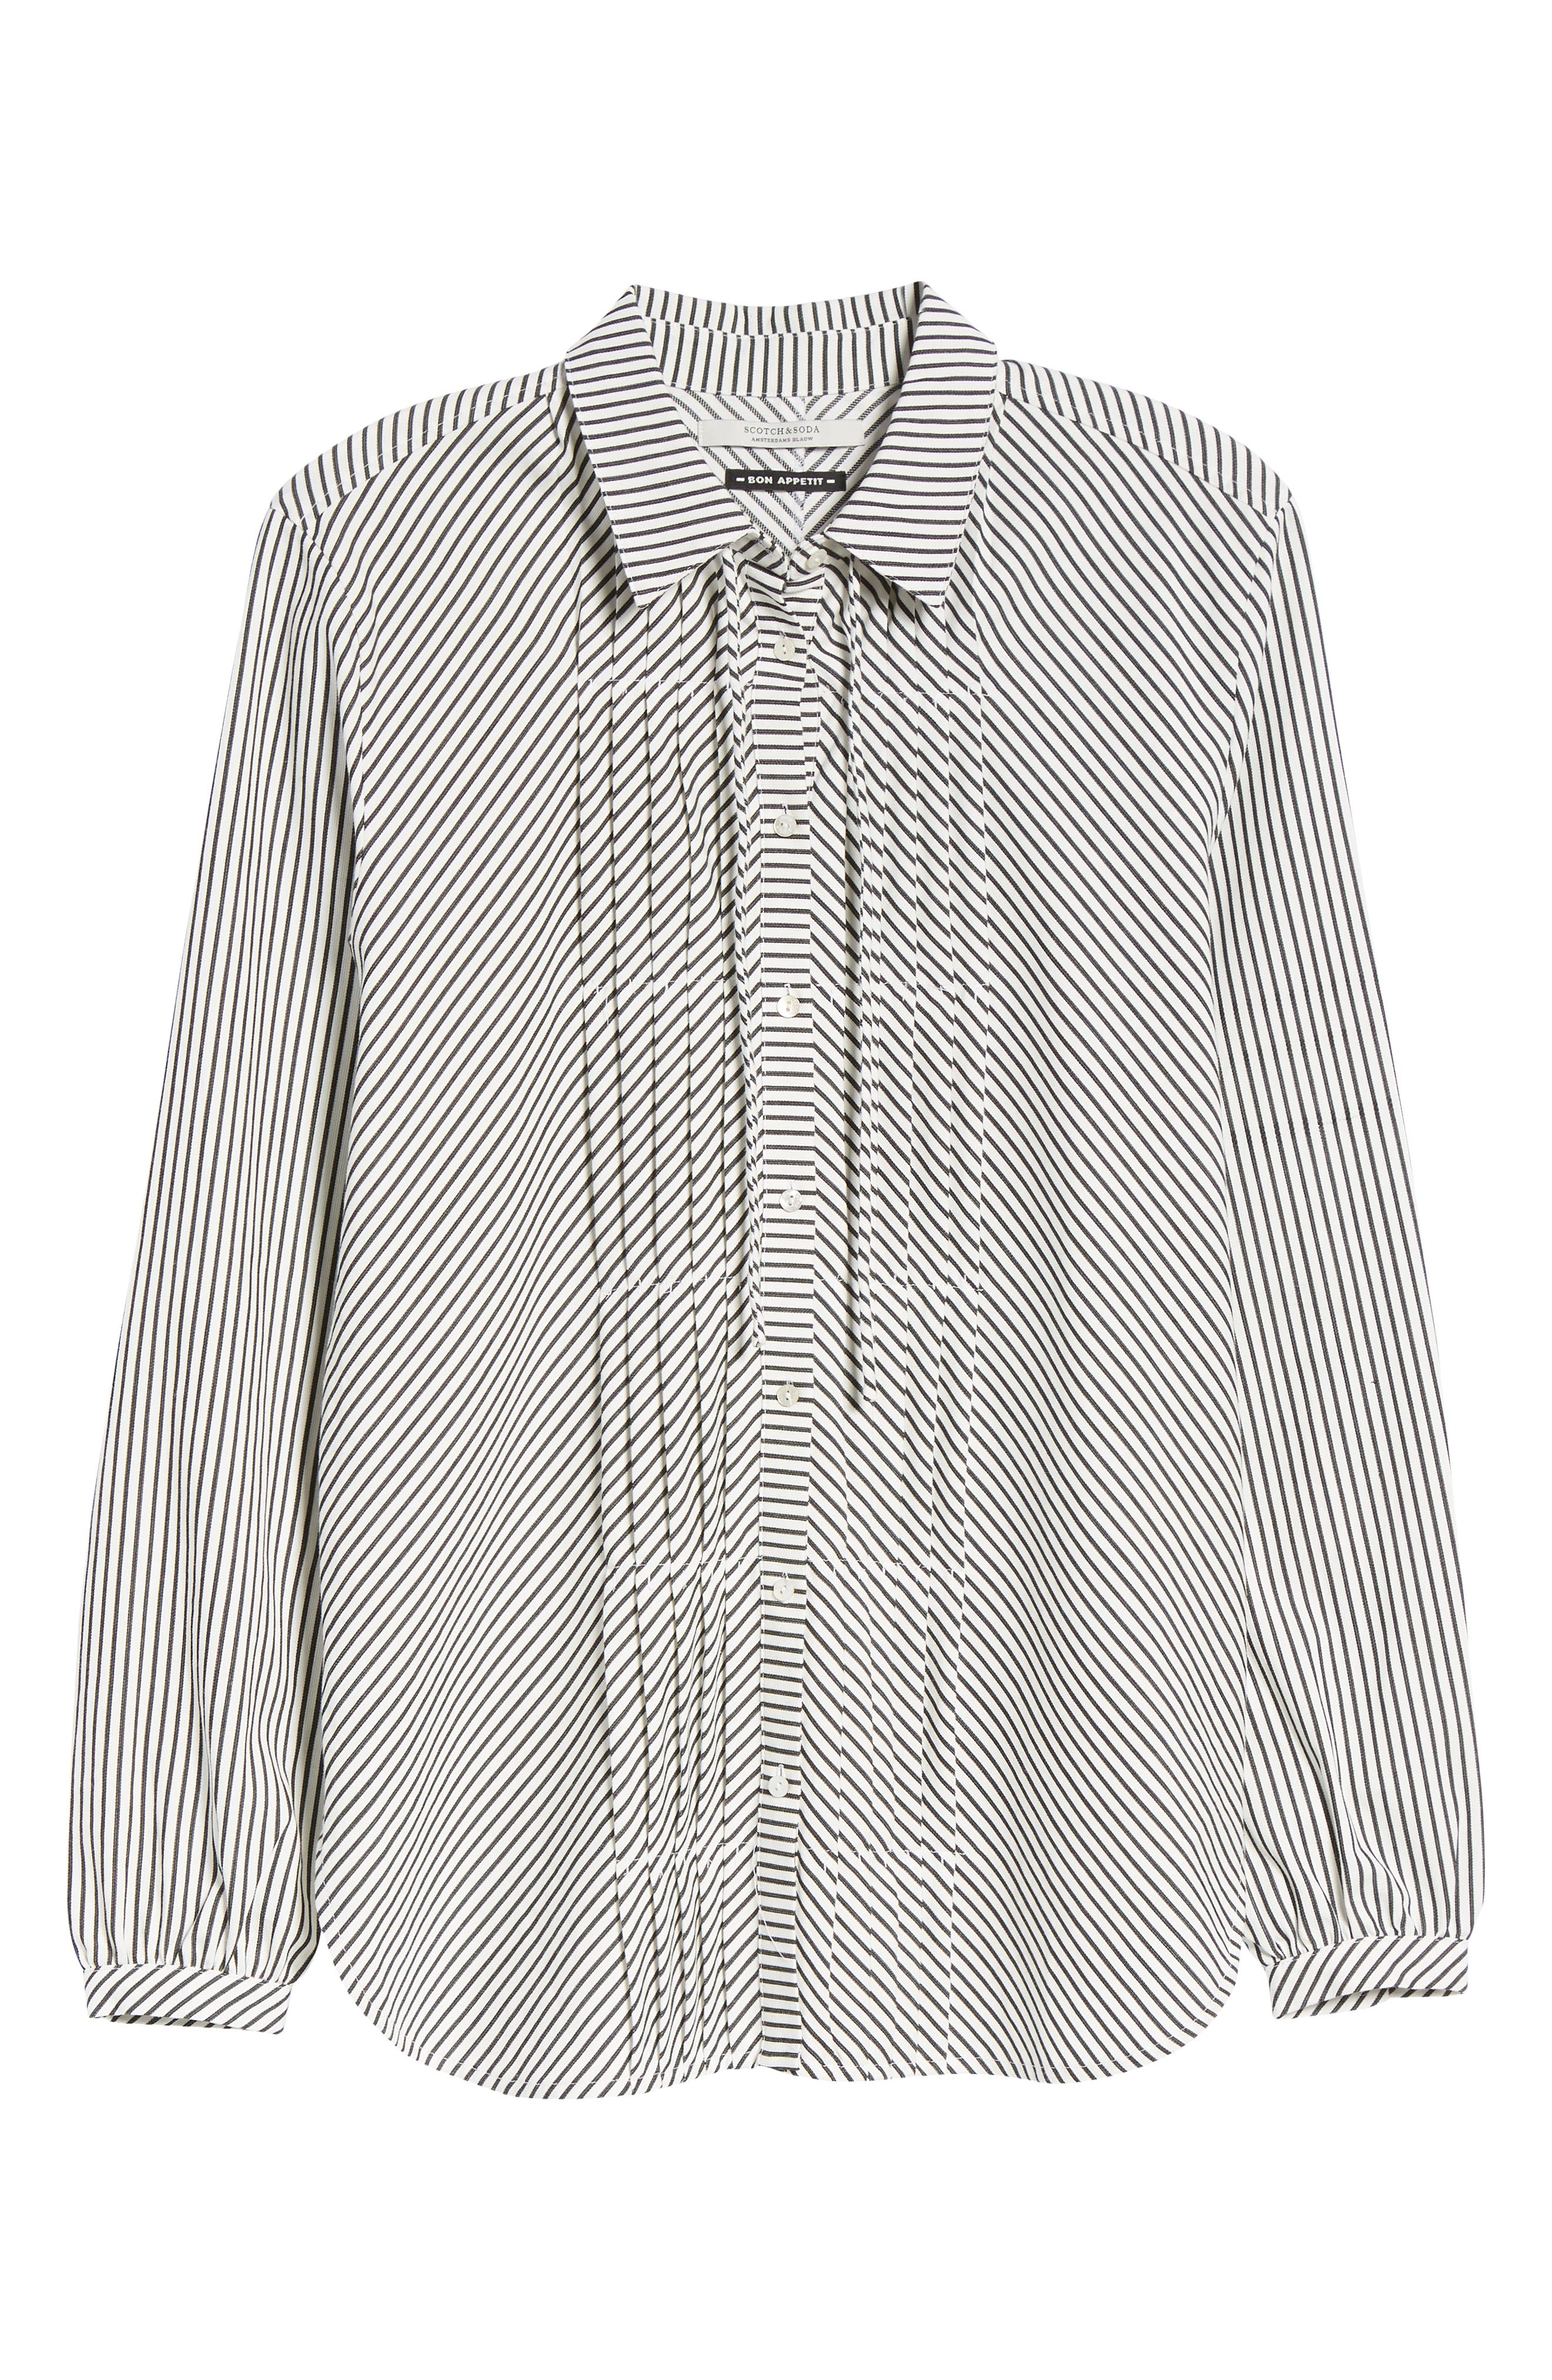 Stripe Pleat Shirt,                             Alternate thumbnail 7, color,                             BLACK/ WHITE PIN STRIPE